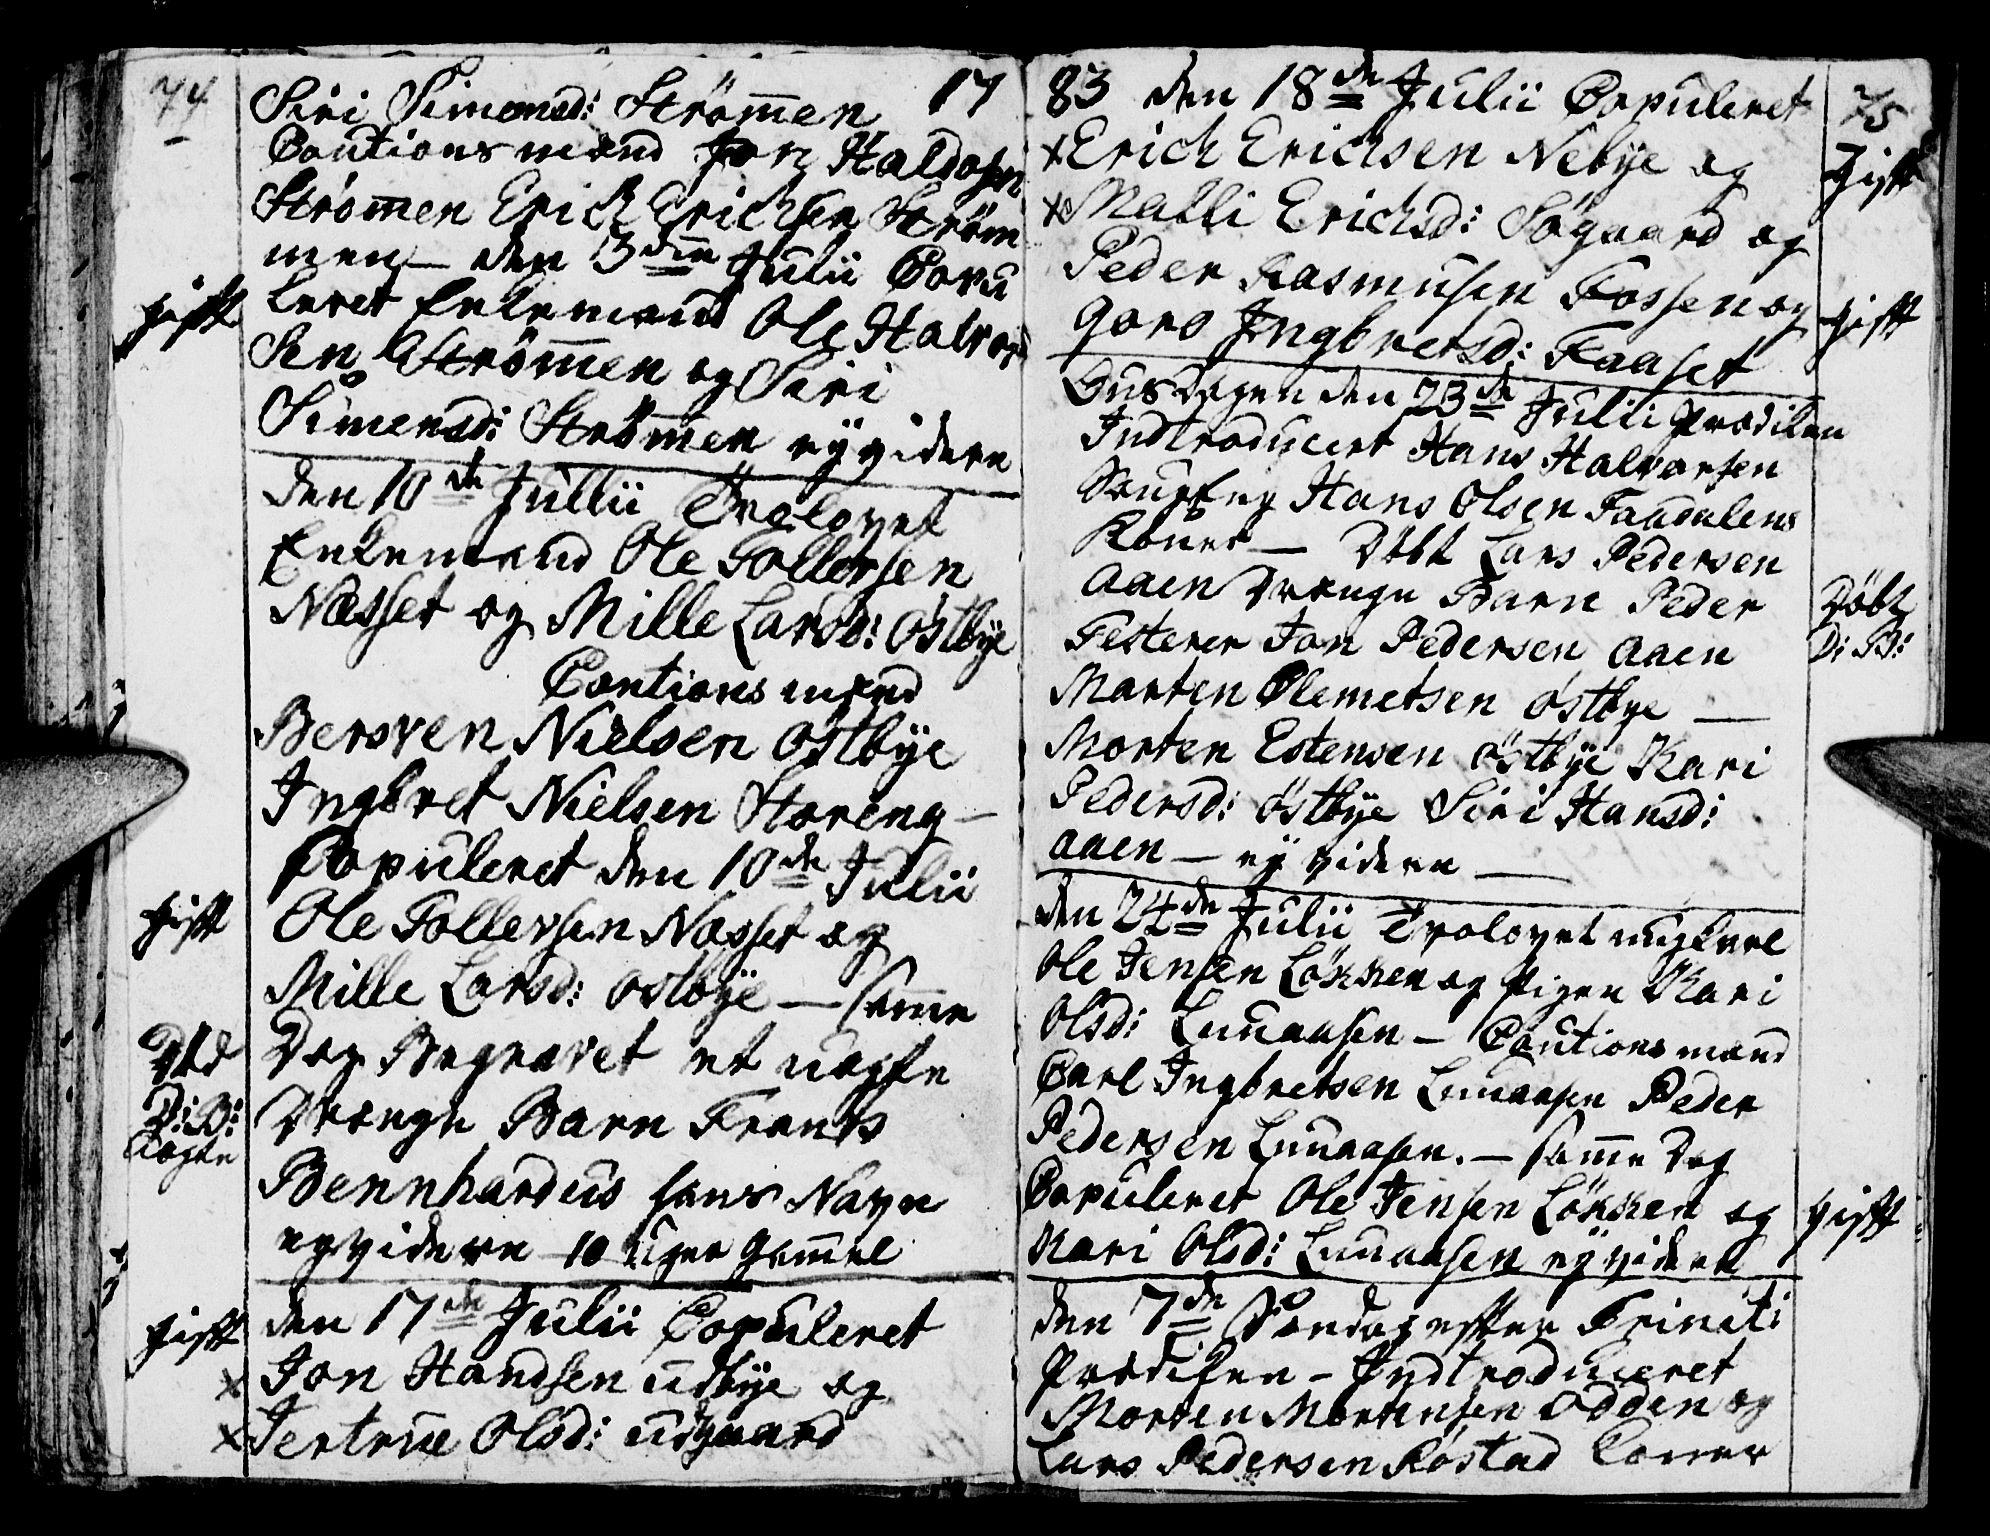 SAH, Tynset prestekontor, Ministerialbok nr. 12, 1780-1784, s. 74-75